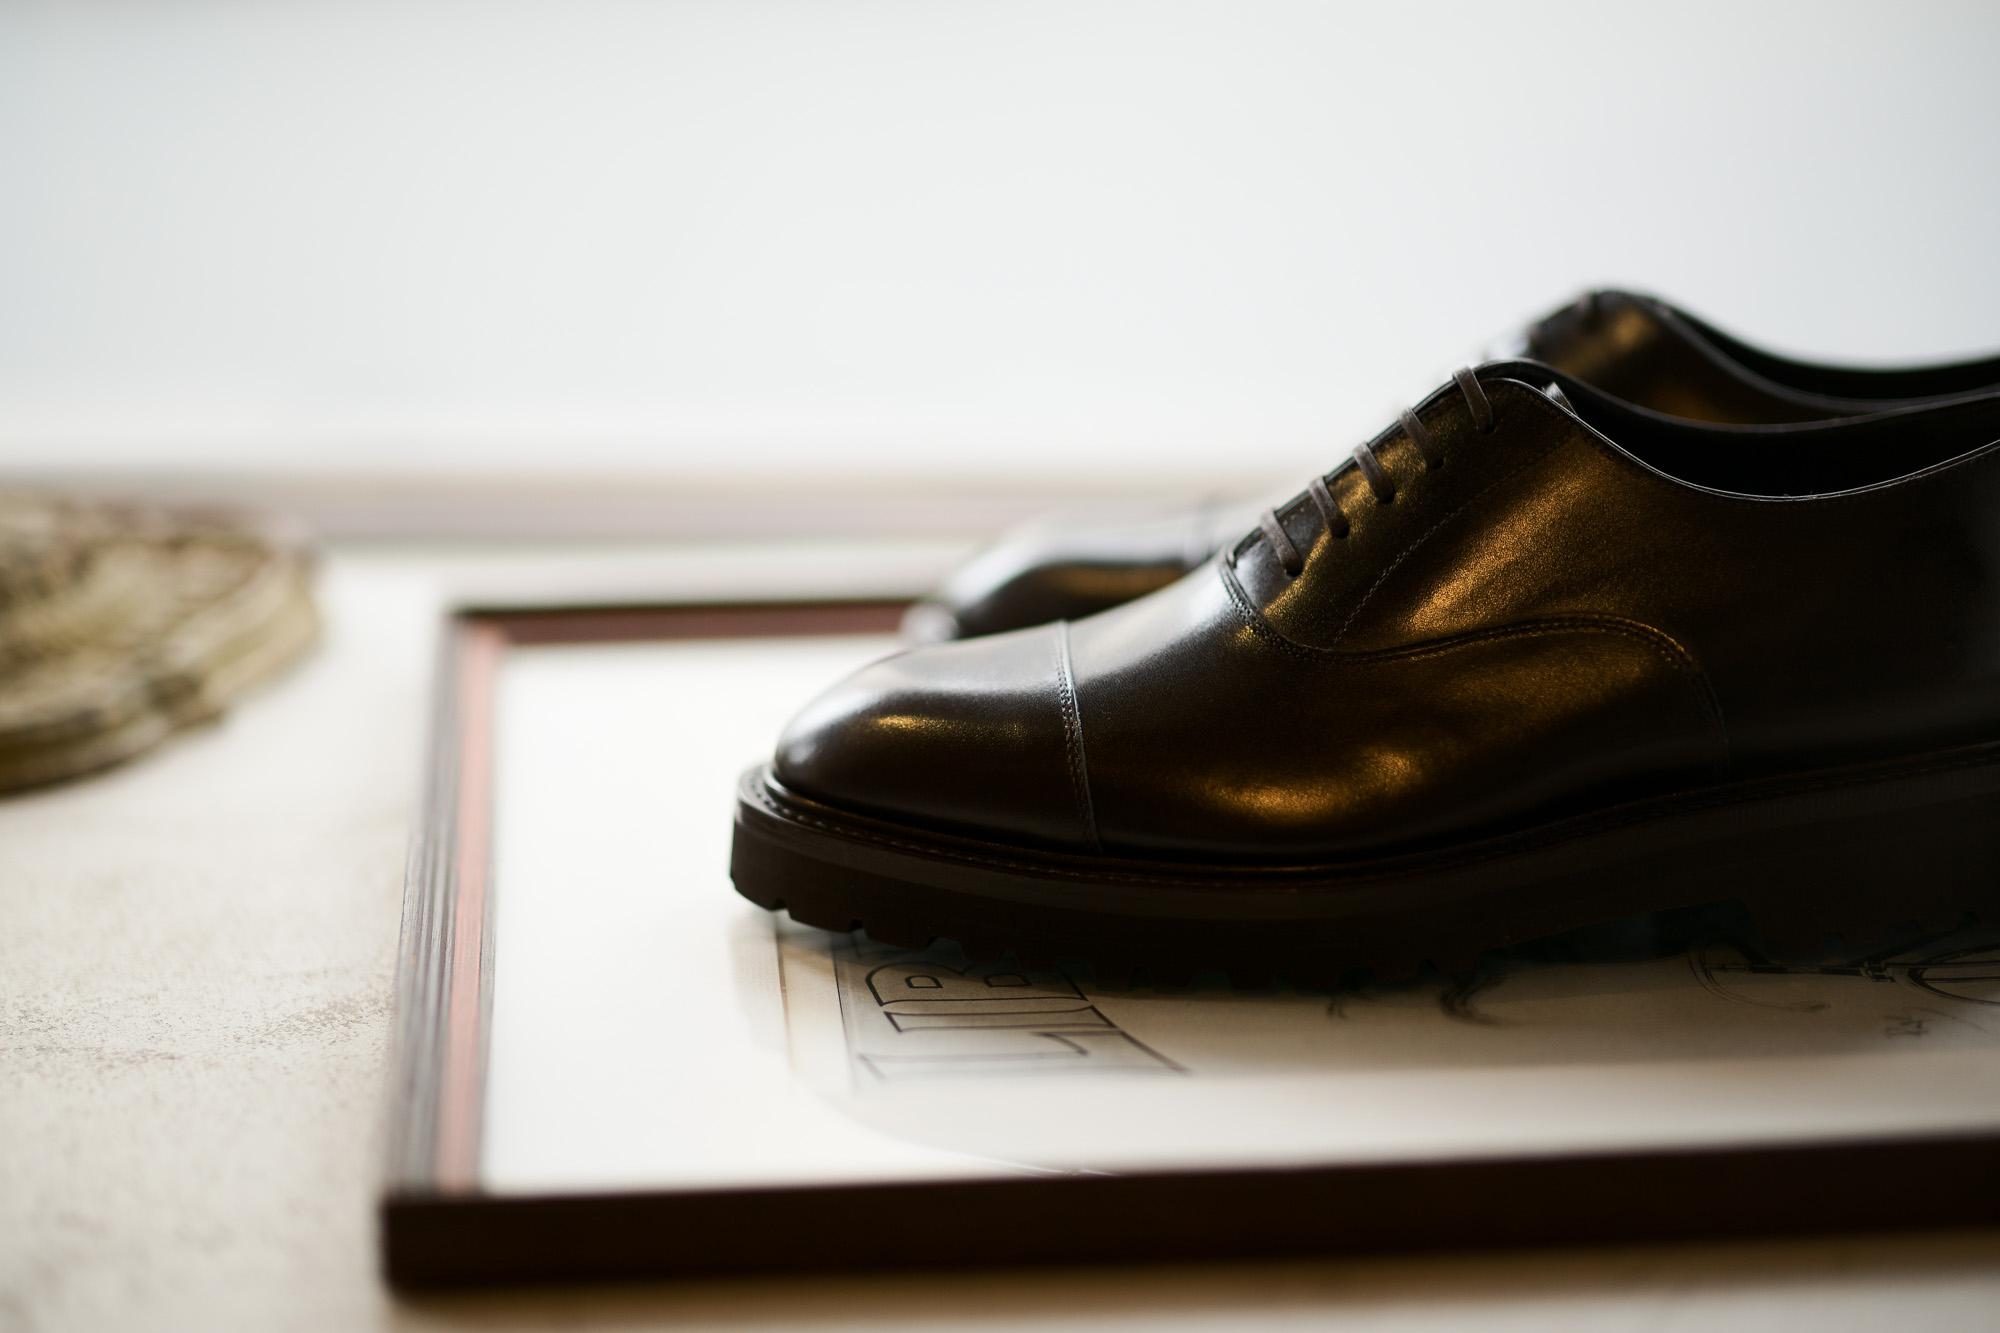 WH (ダブルエイチ) WHS-0110 Straight chip Shoes (干場氏 スペシャル モデル) Trench Last (トレンチラスト) ANNONAY Vocalou Calf Leather ストレートチップ シューズ DARK BROWN (ダークブラウン) MADE IN JAPAN(日本製) 2019 春夏新作 【2019春夏フリー分発売中】干場さん 干場スペシャル FORZASTYLE フォルザスタイル 愛知 名古屋 Alto e Diritto アルト エ デリット